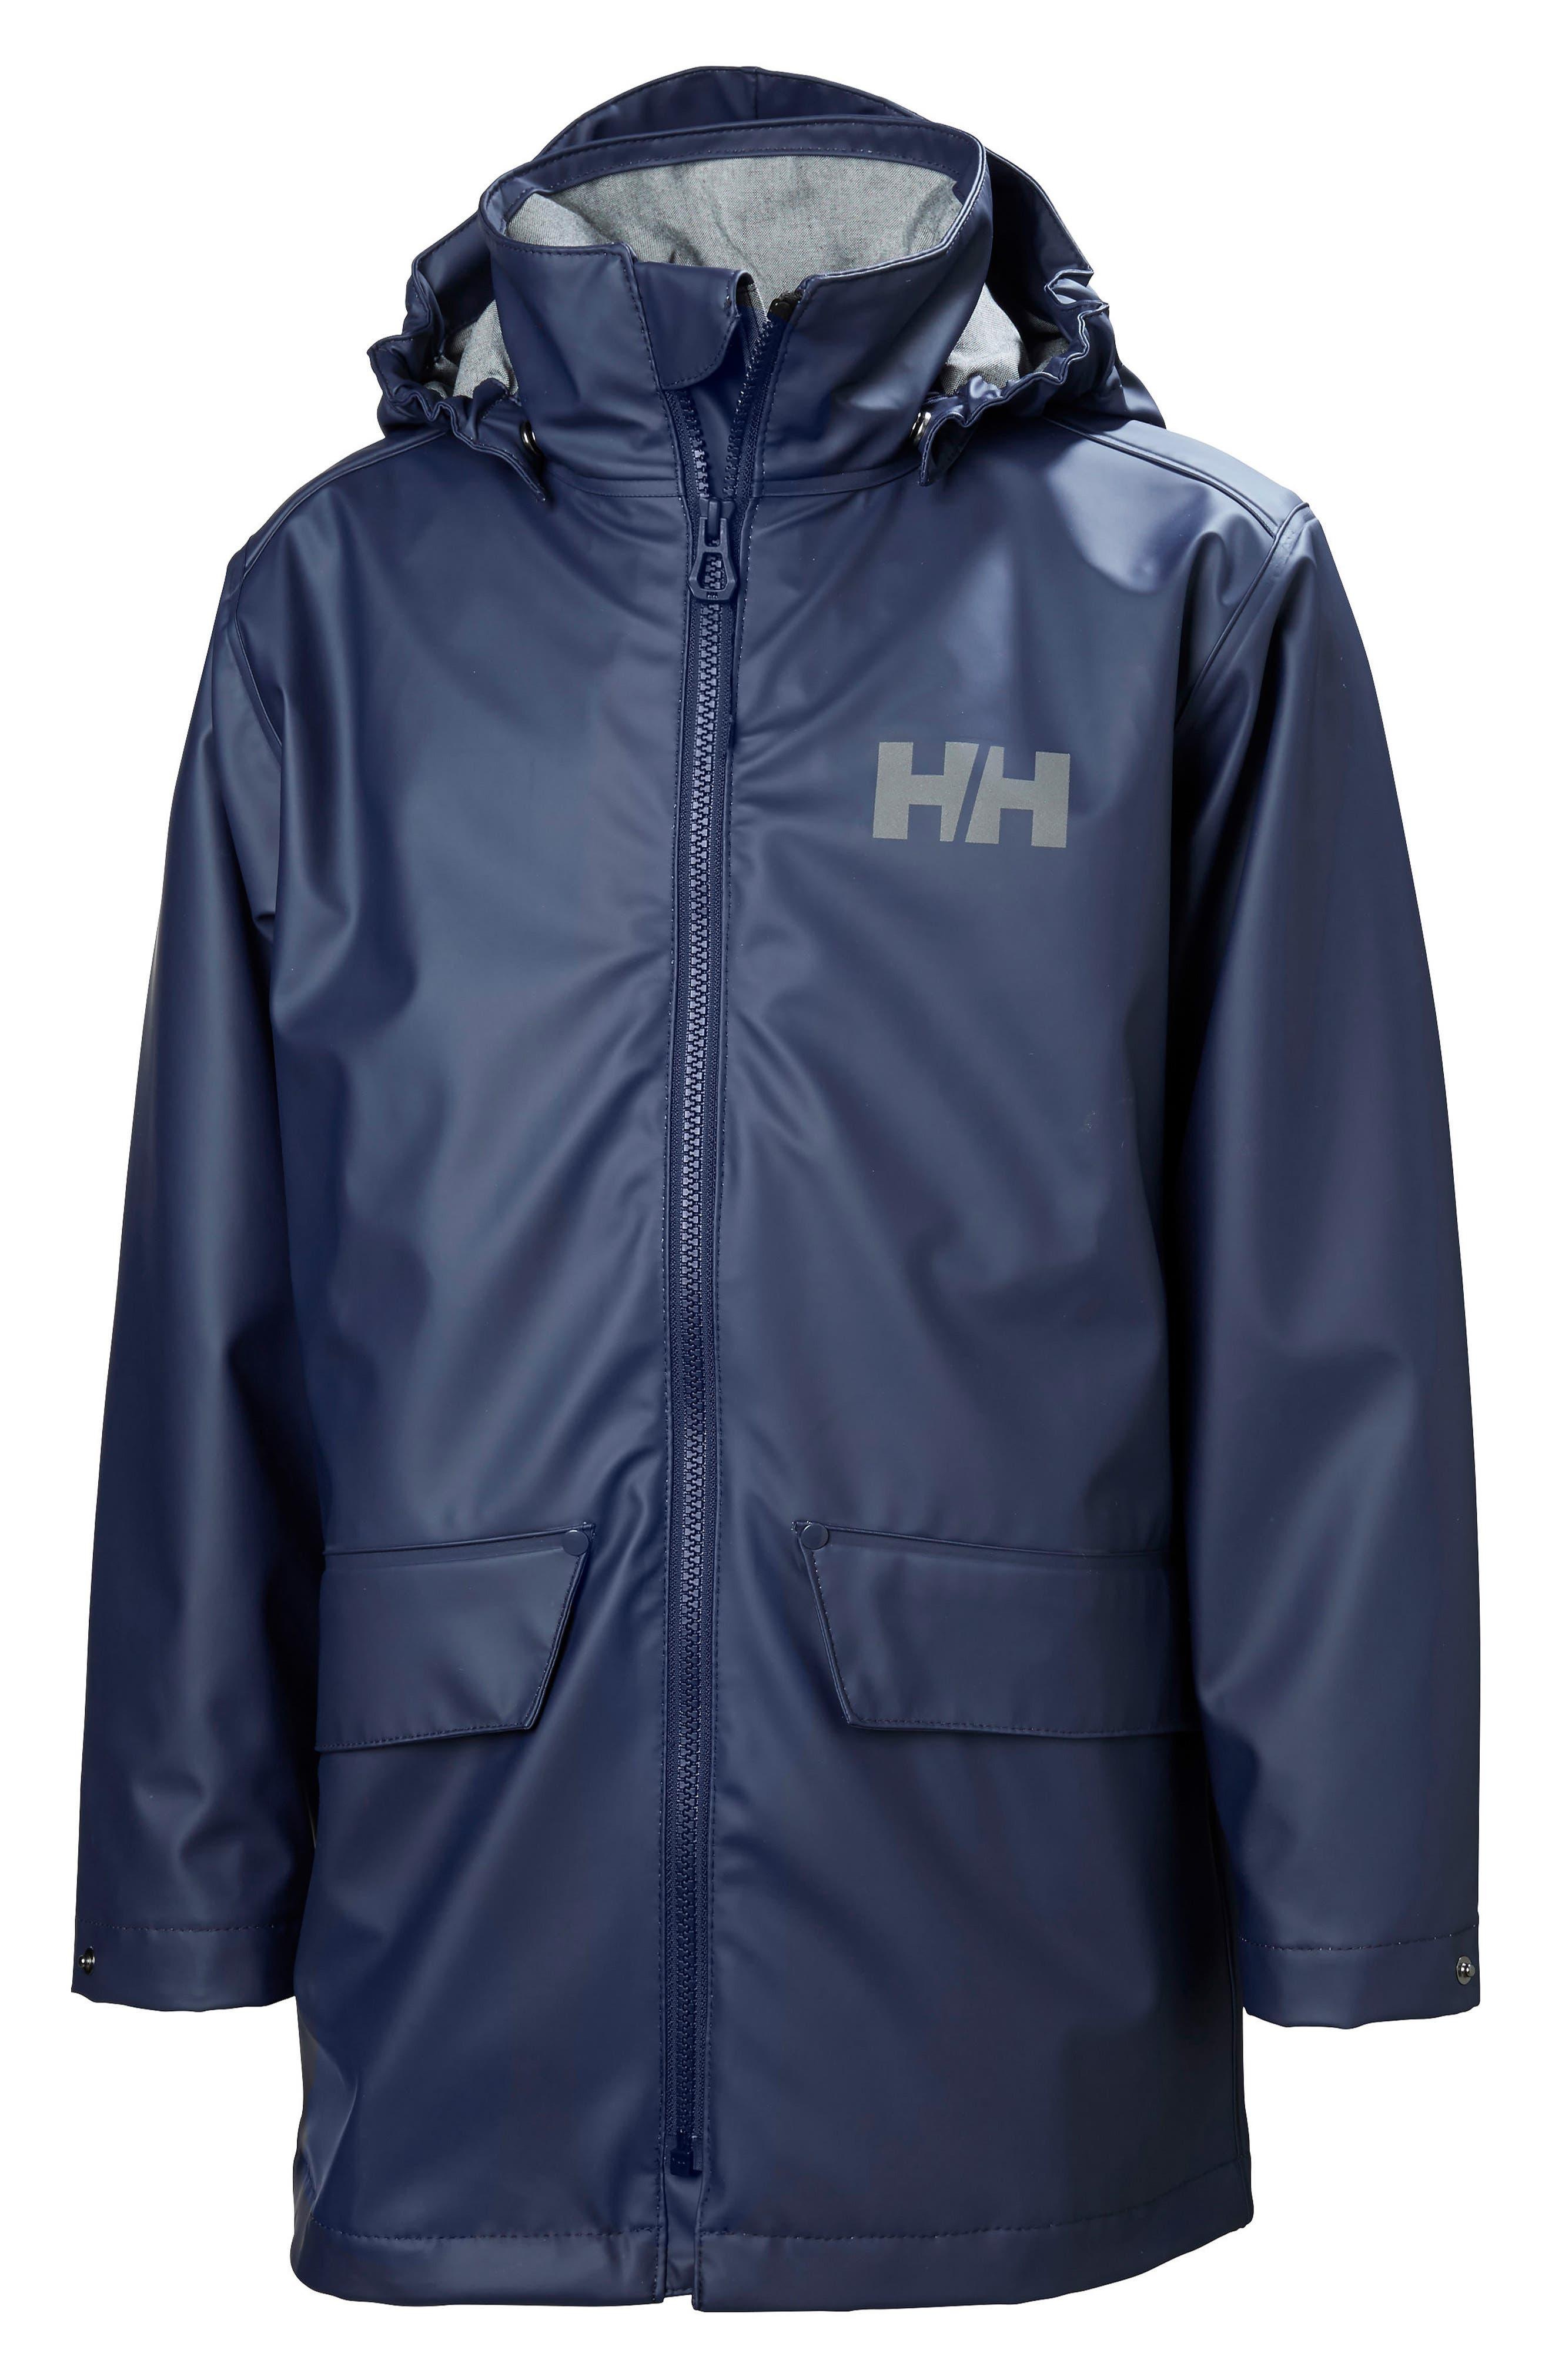 HELLY HANSEN Skudenes Waterproof & Windproof Hooded Jacket, Main, color, 400